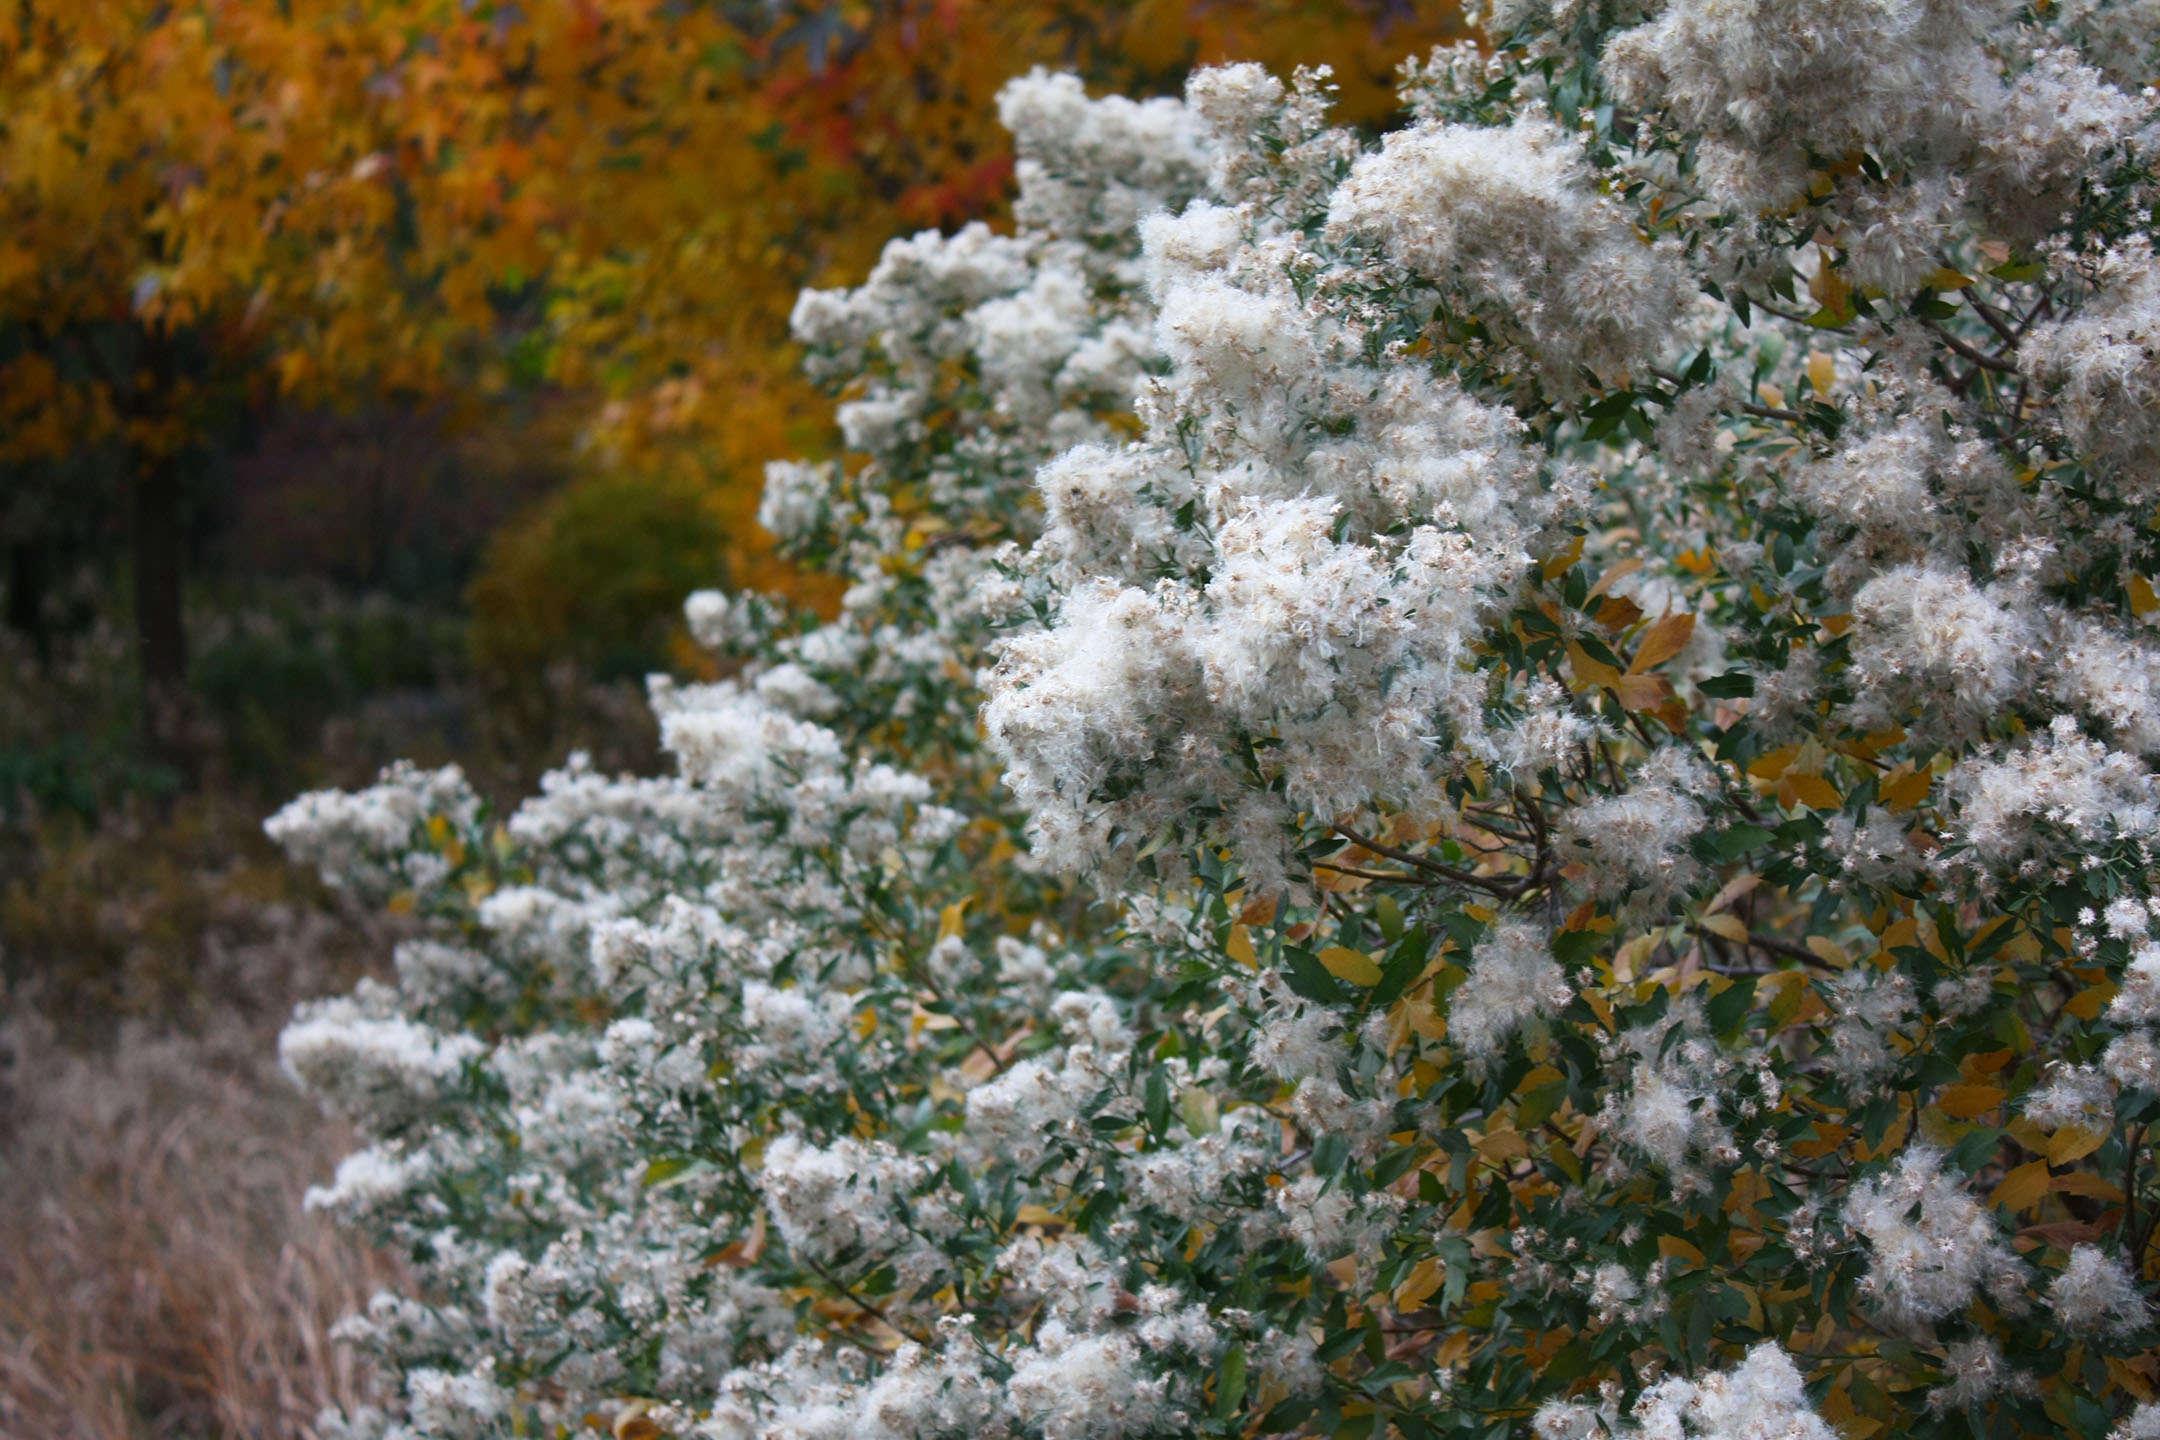 True Colors: 9 Best Shrubs for Fall Foliage - Gardenista